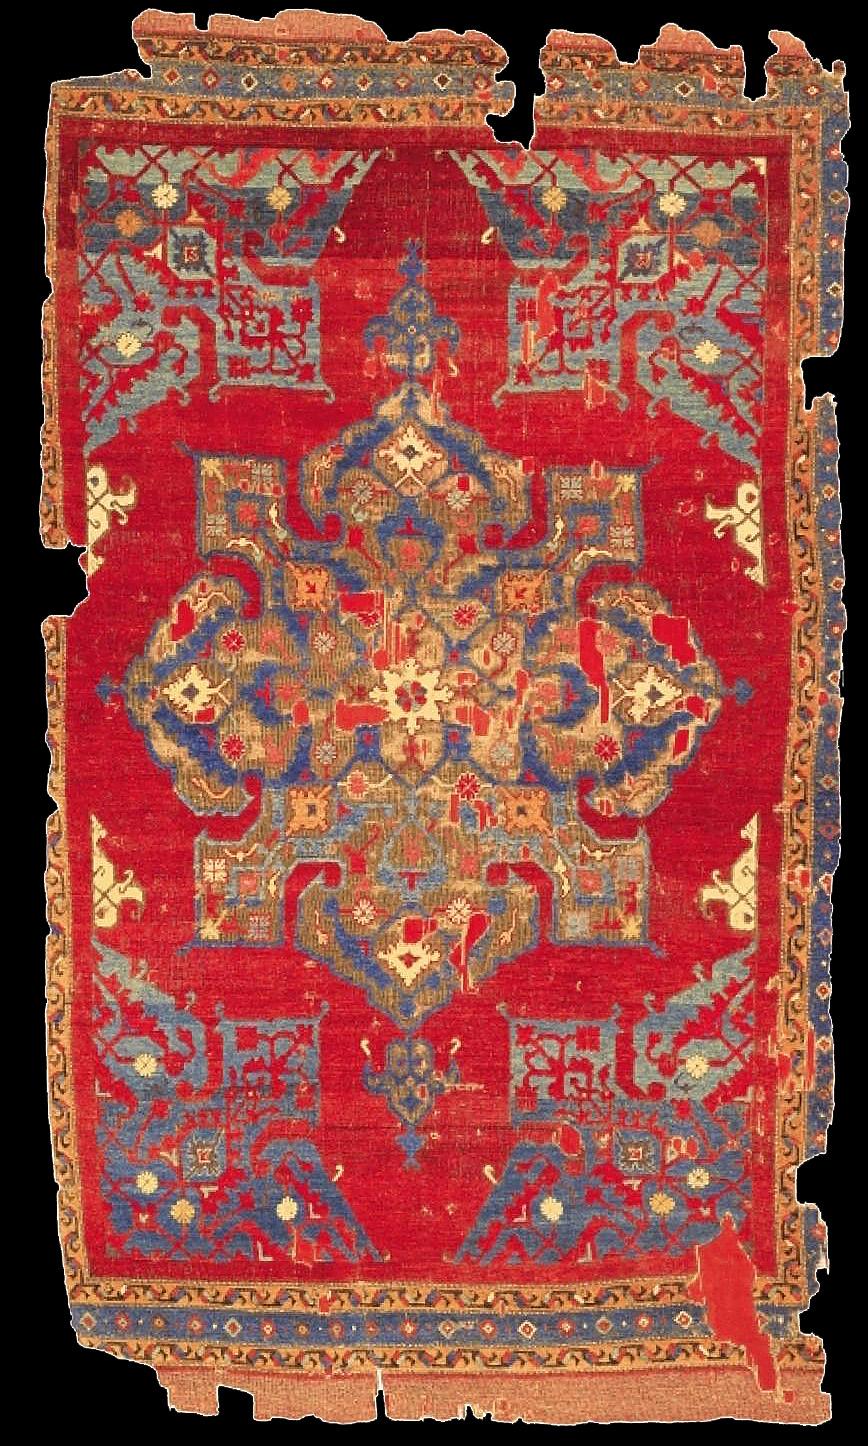 An early star Ushak carpet, 16th century, Western Anatolia